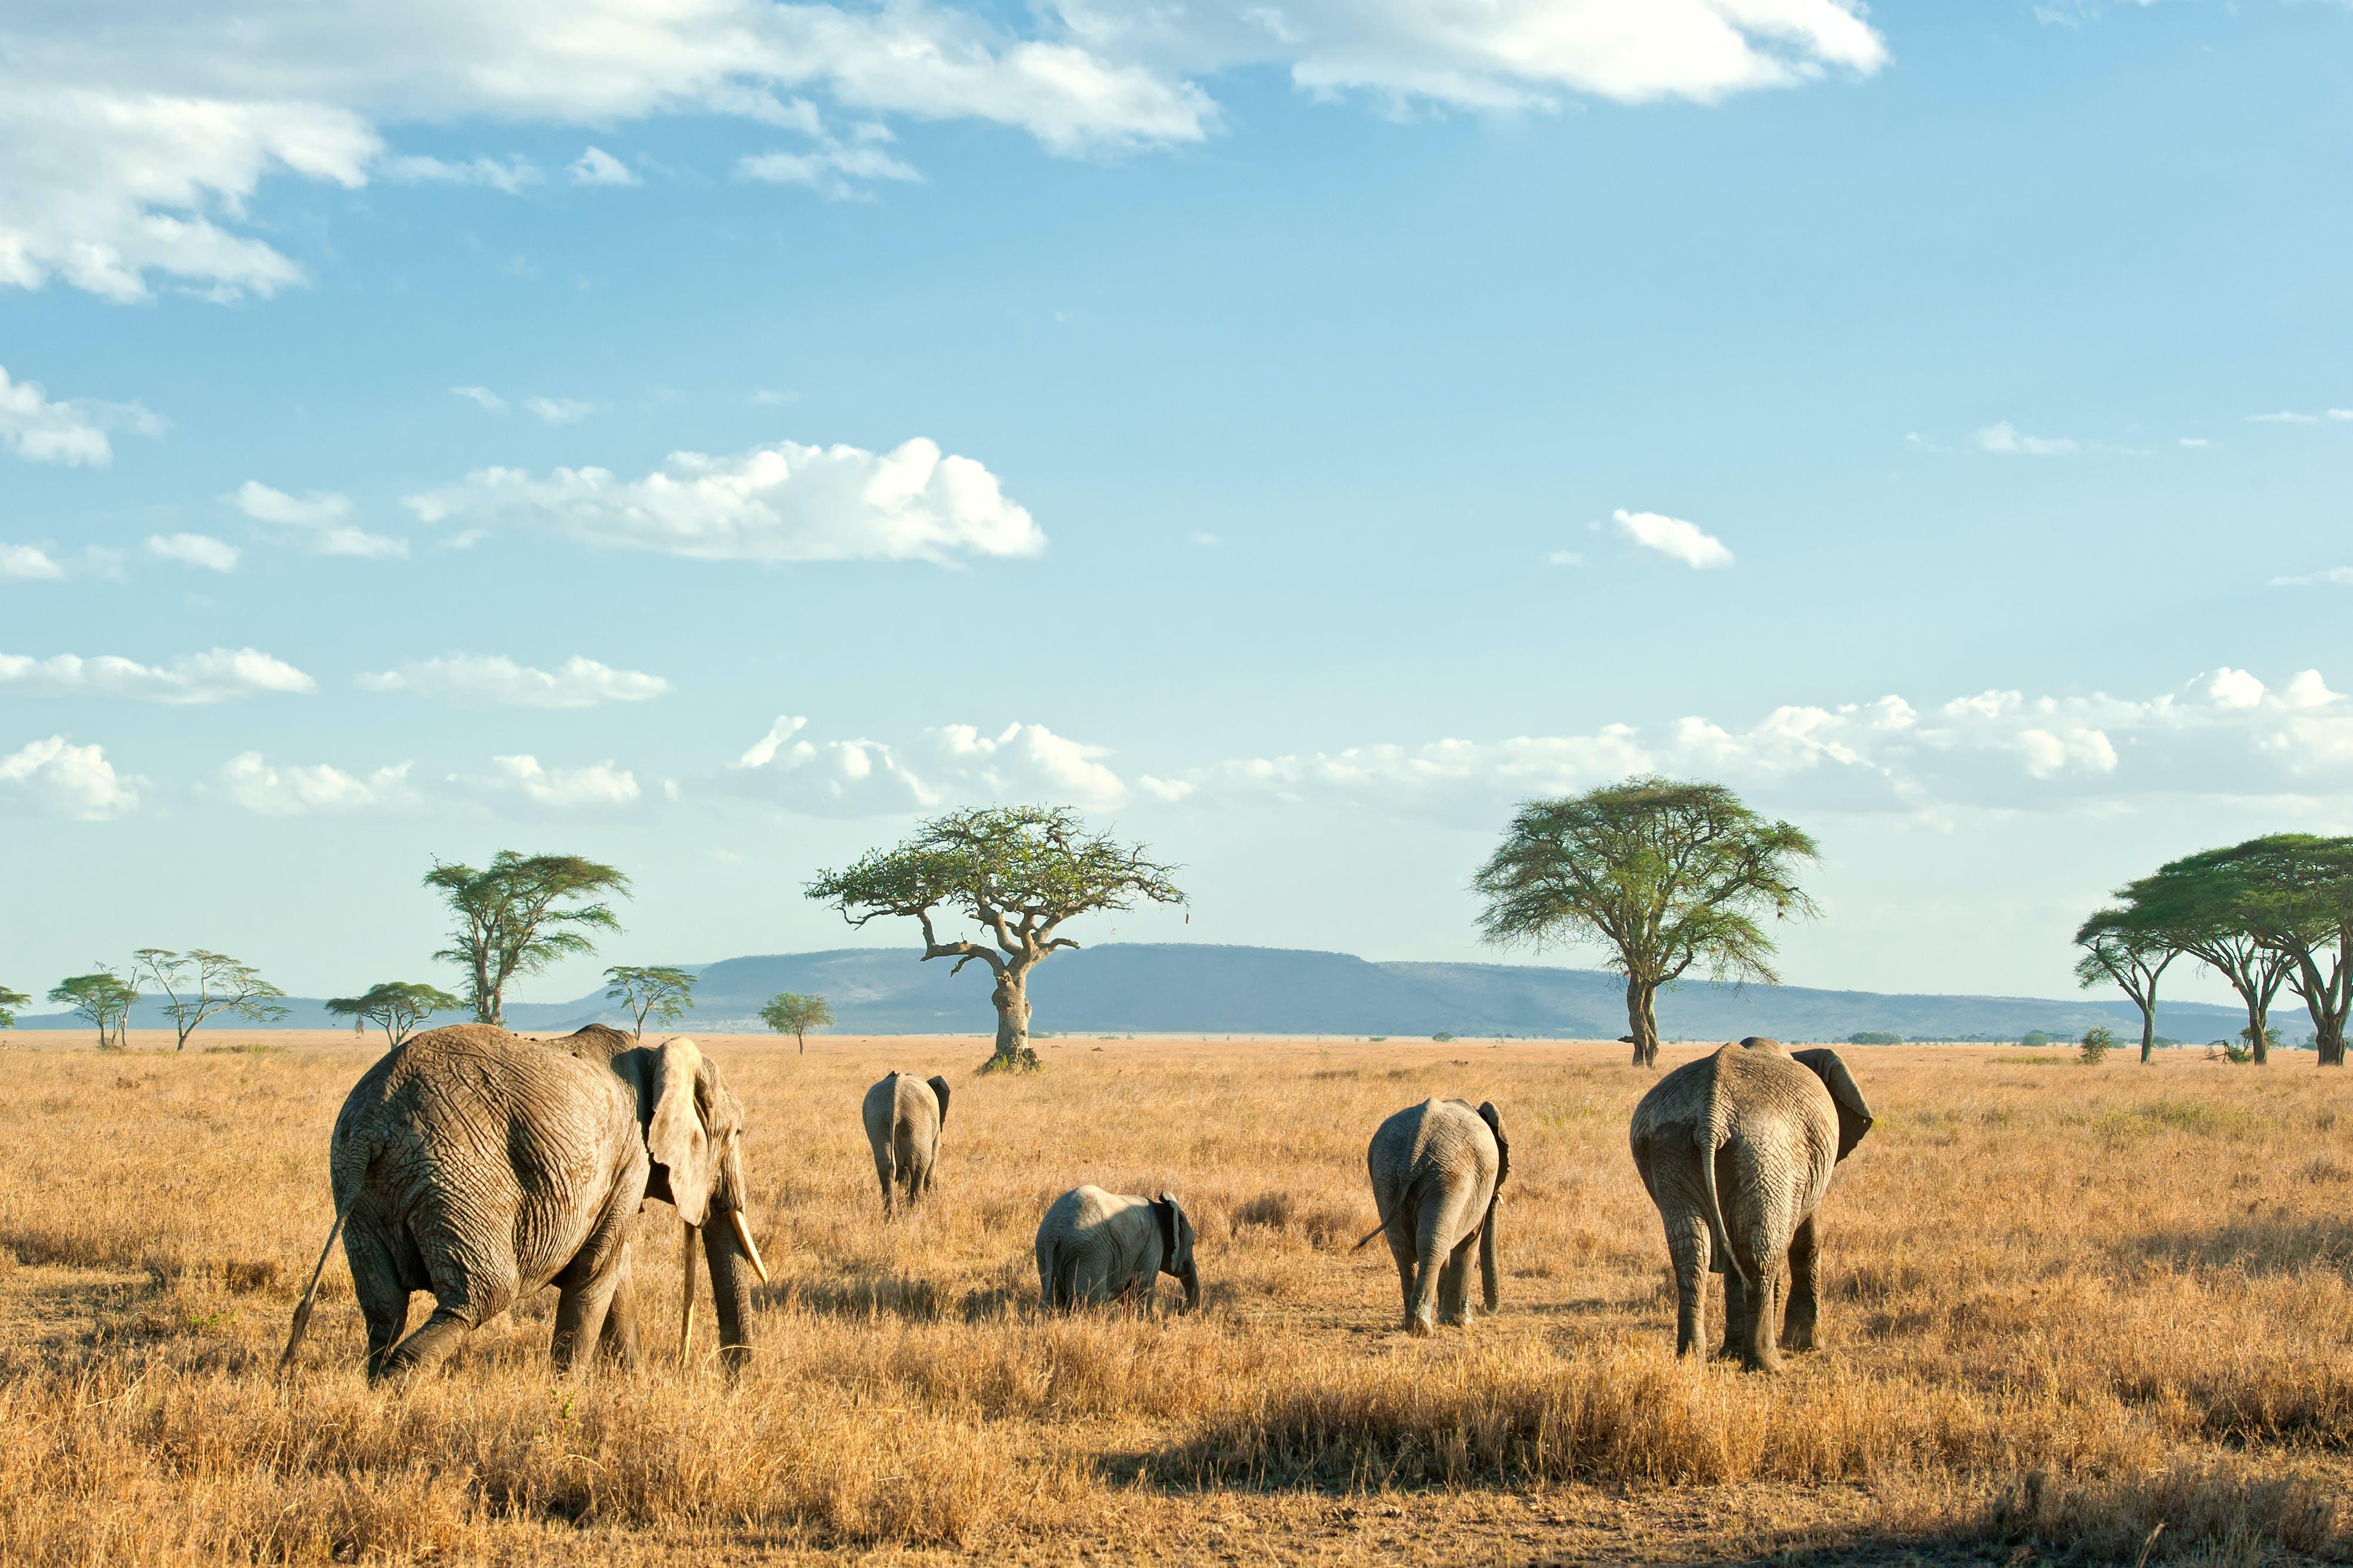 Elephants On The Serengeti Plains In Tanzania